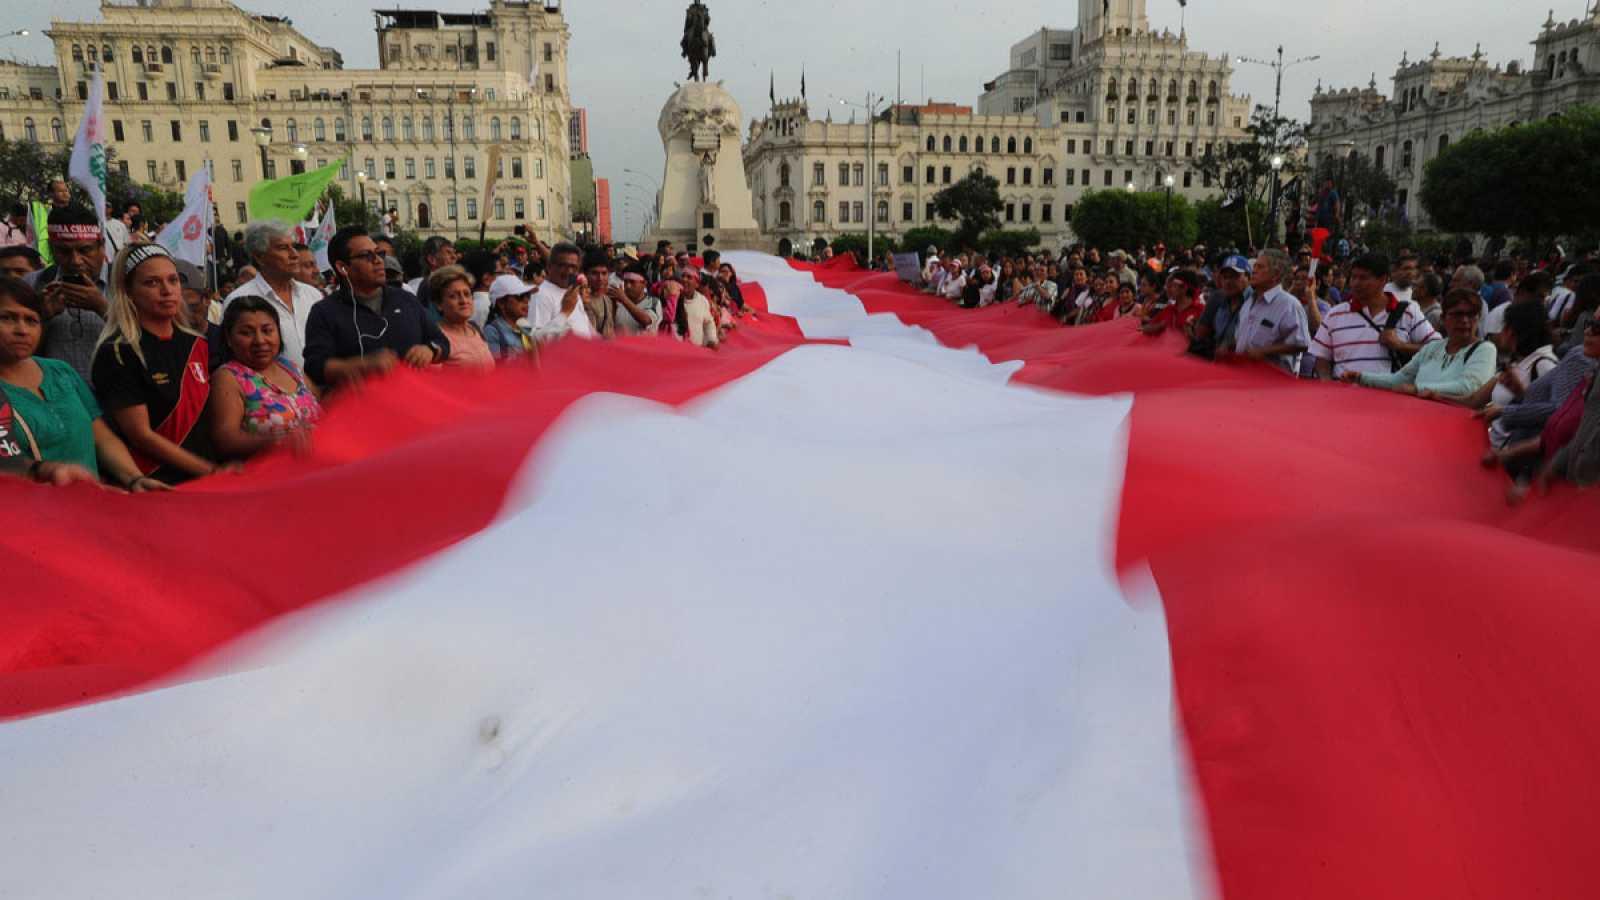 Marcha en Perú para exigir la renuncia del Fiscal general